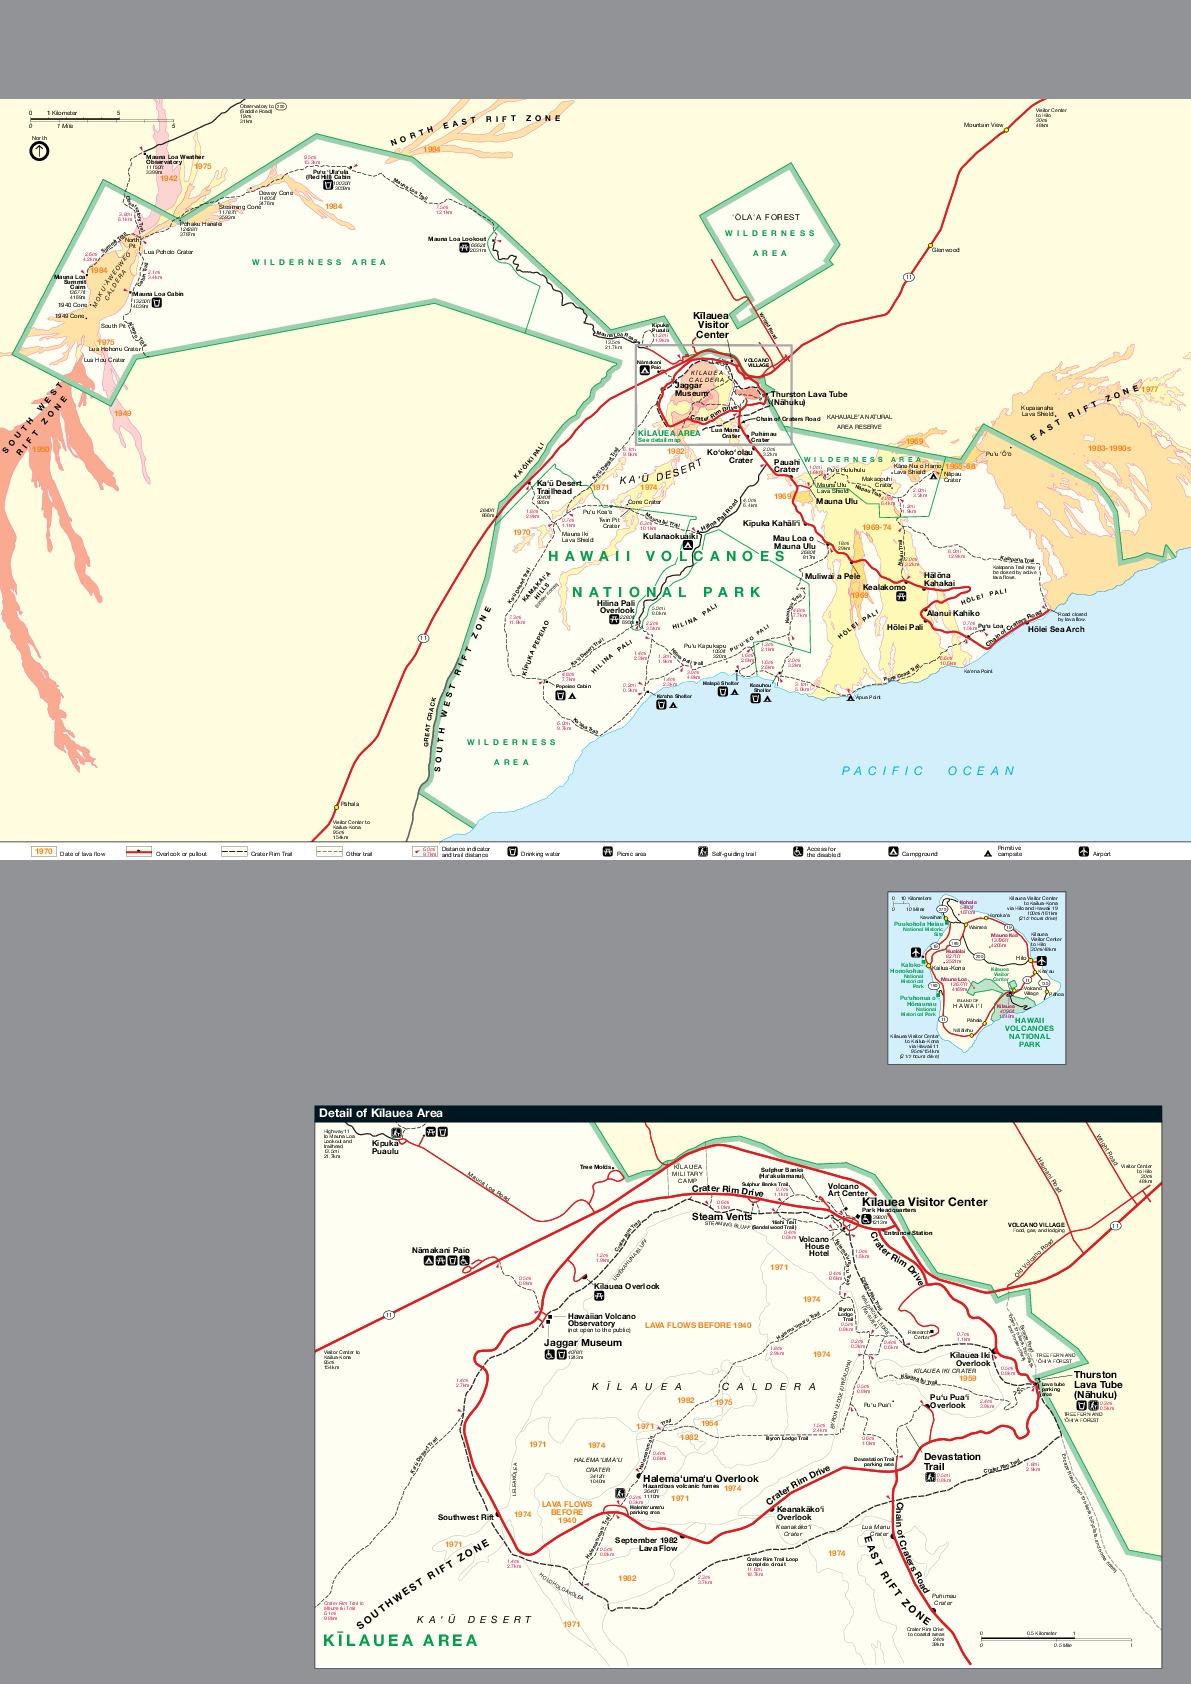 Hawaii Volcanoes National Park Map, Hawaii, United States